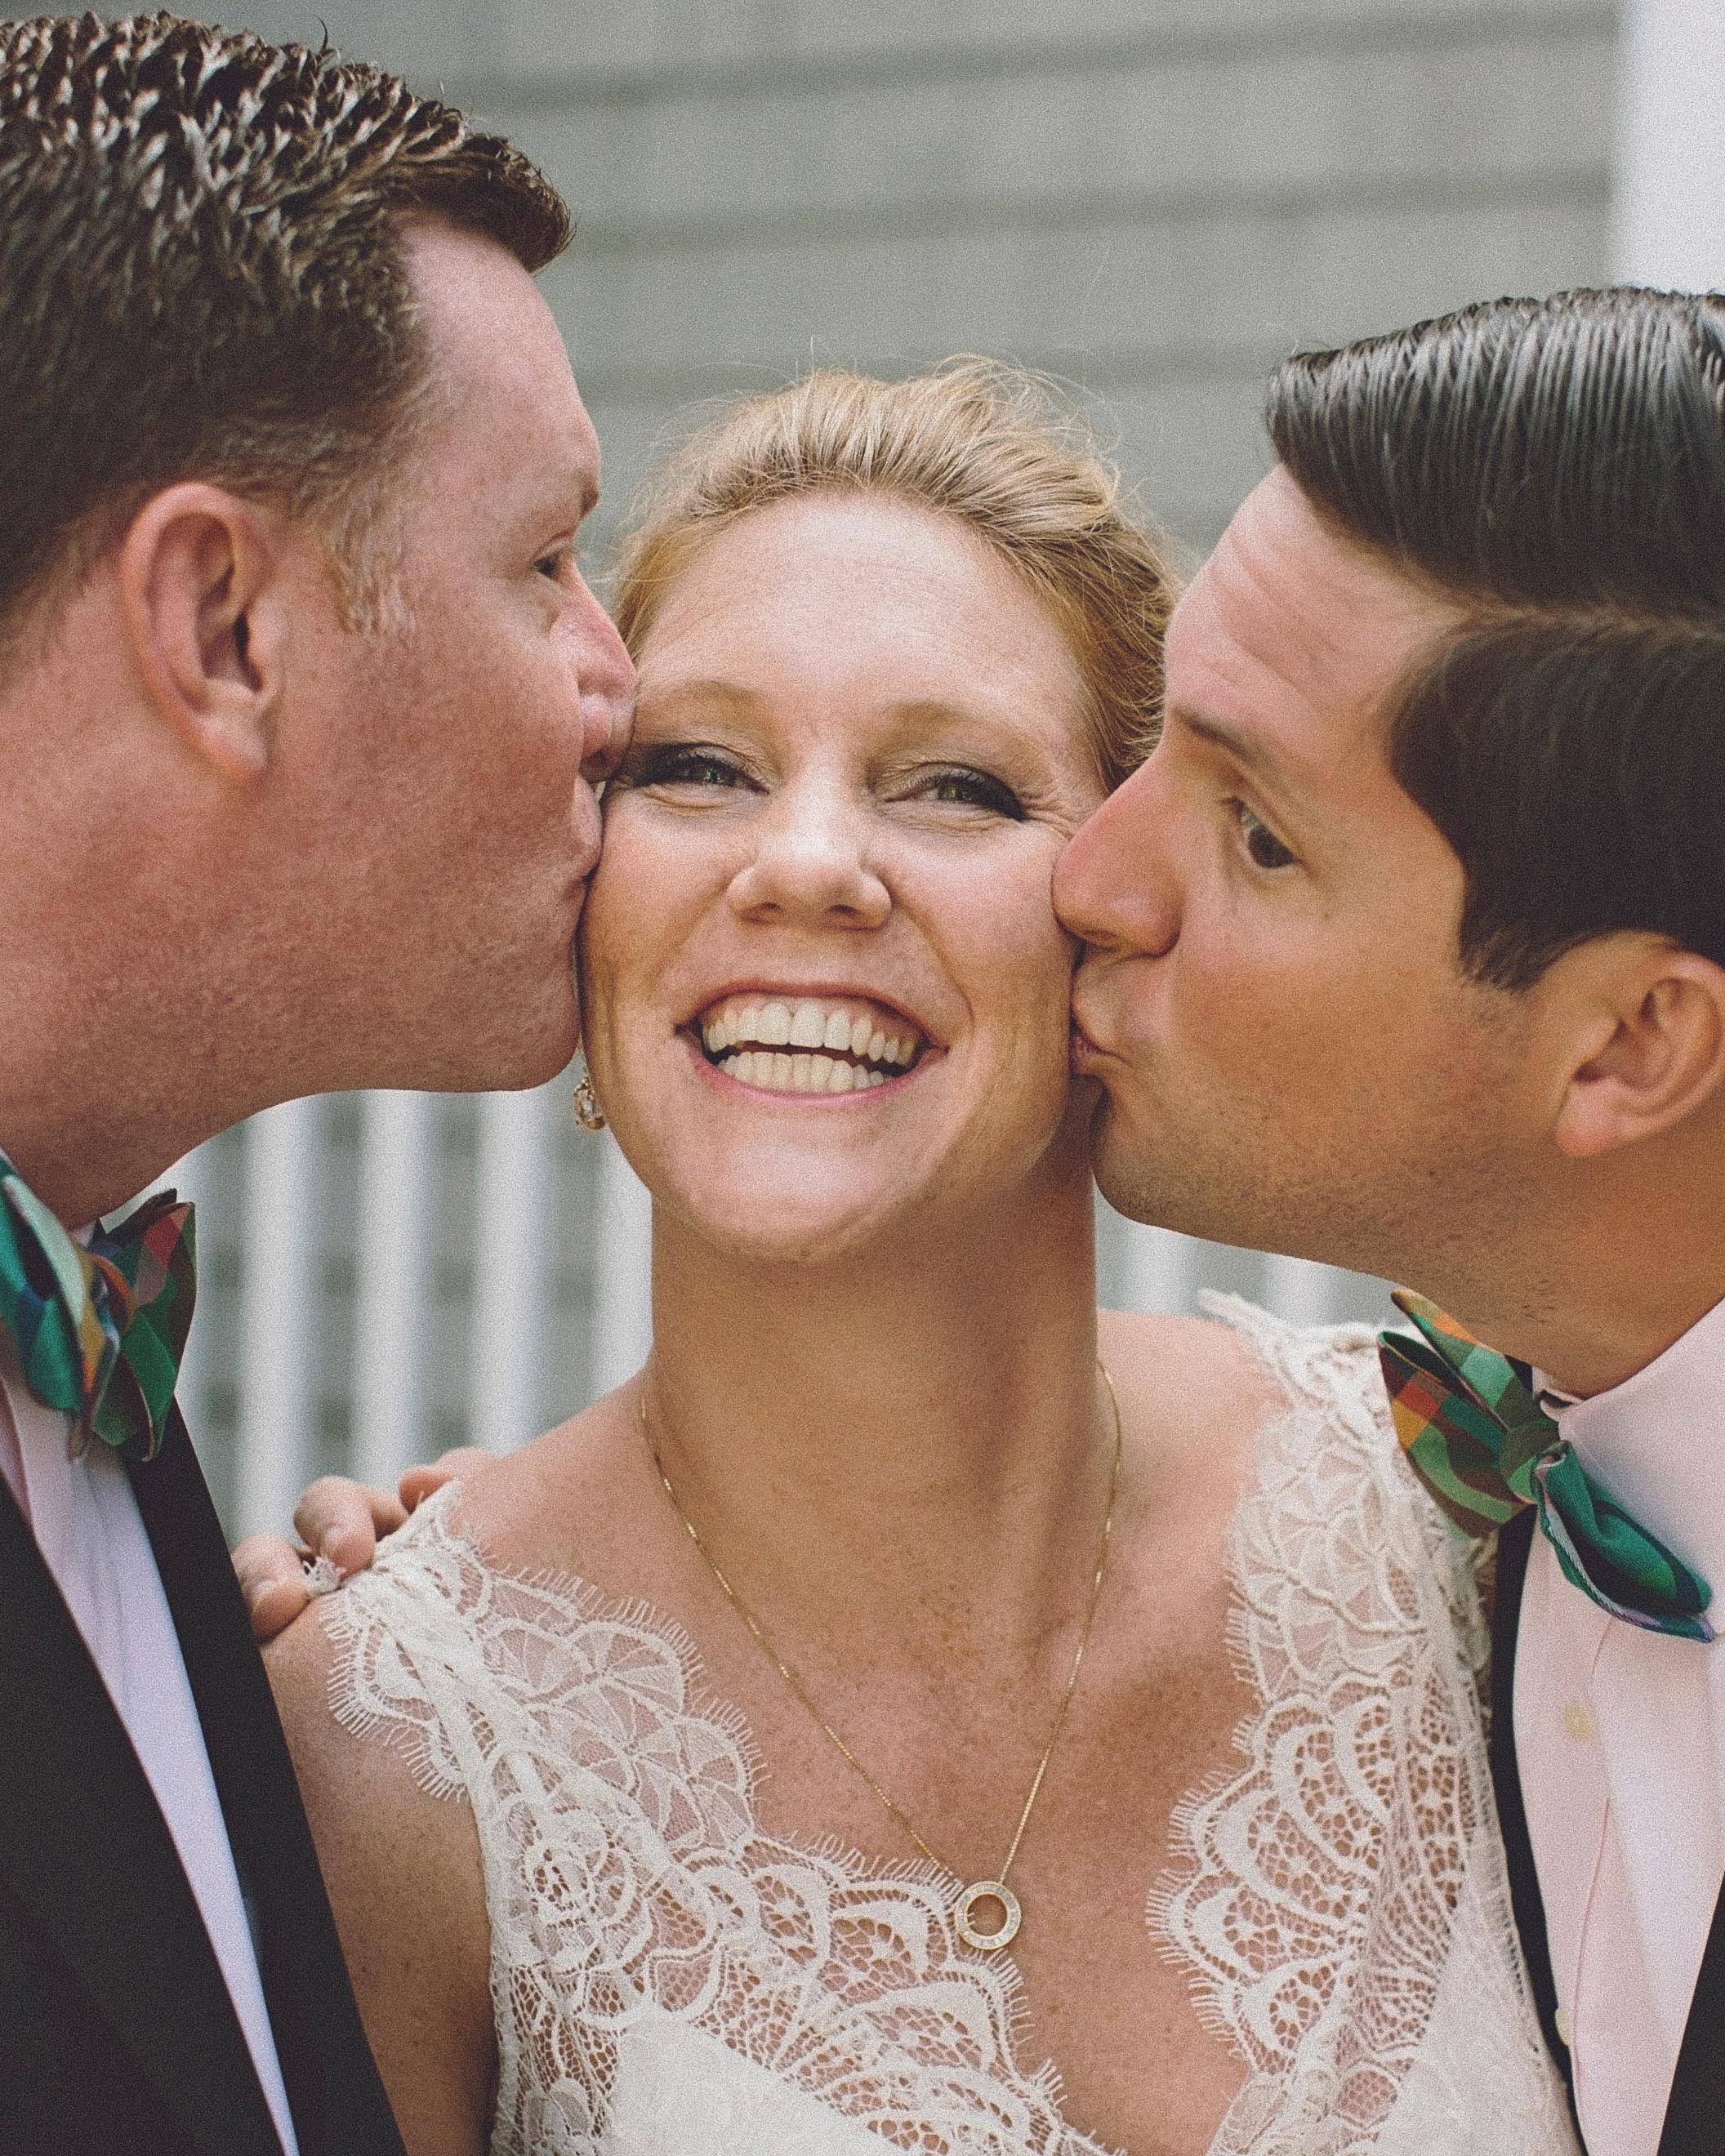 molly-greg-wedding-kiss-00024-s111481-0814.jpg